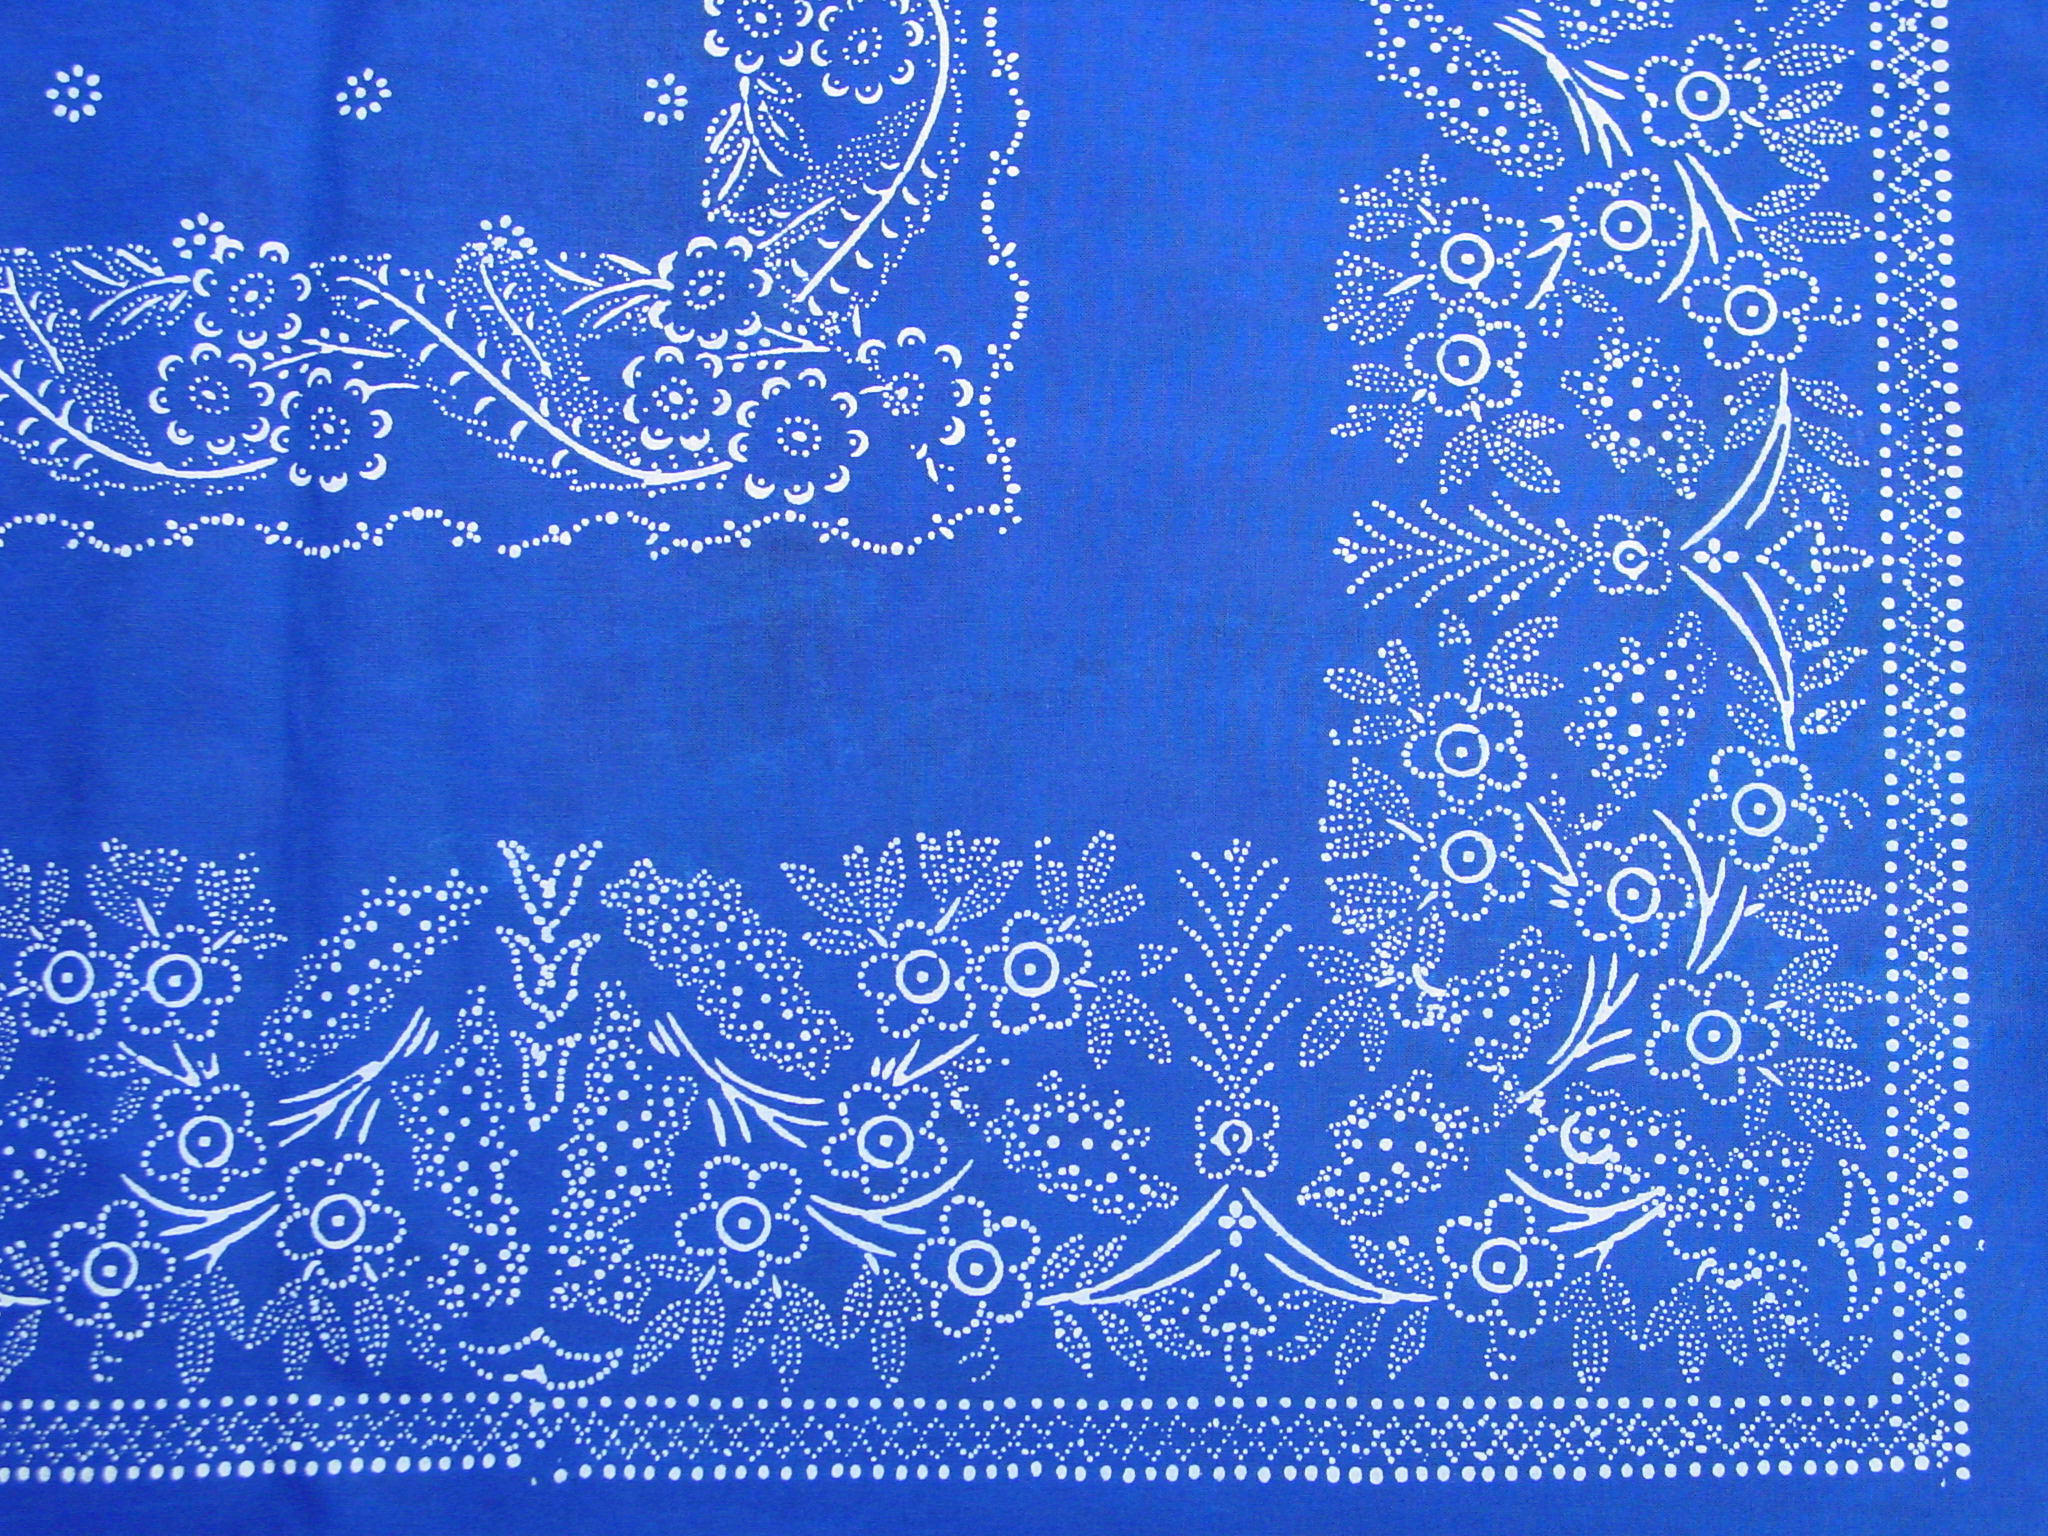 Große Blaudruck-Tischdecke 6482-1291